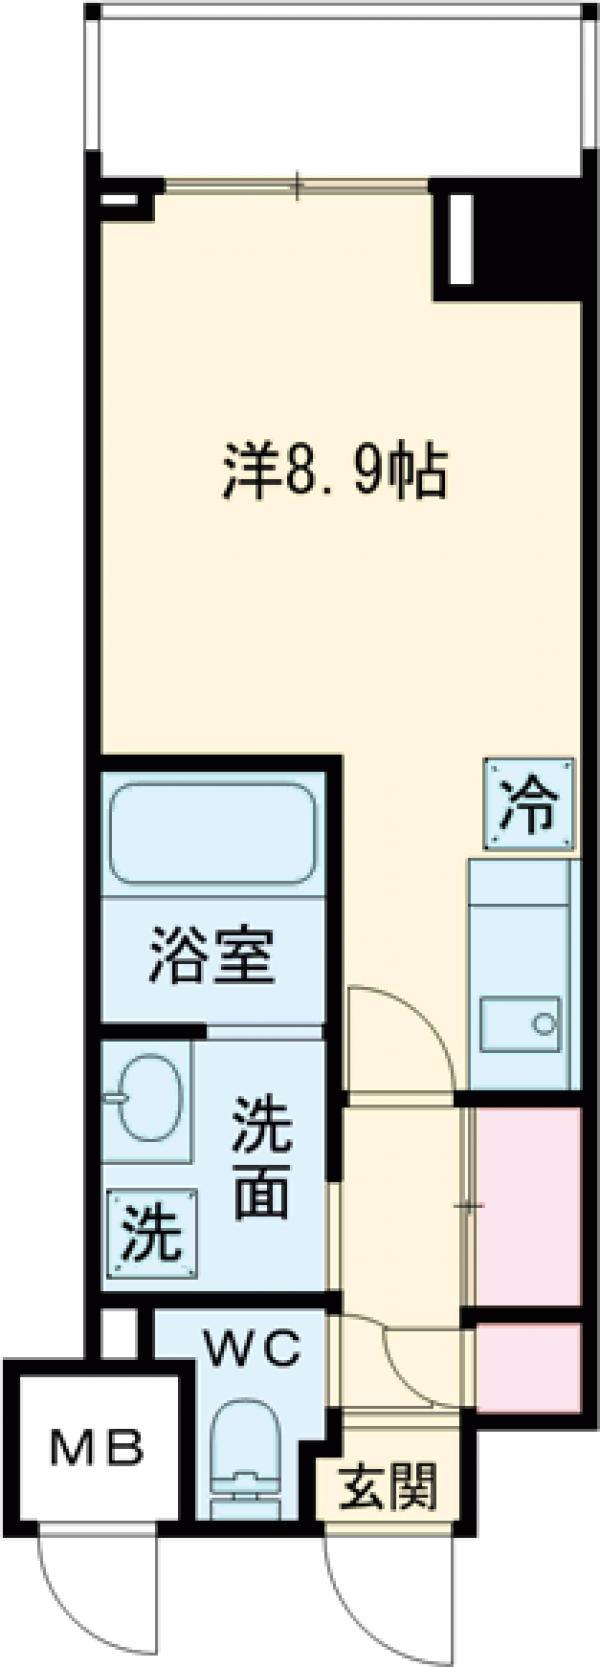 ART APARTMENT IN TOKYO NORTH・206号室の間取り